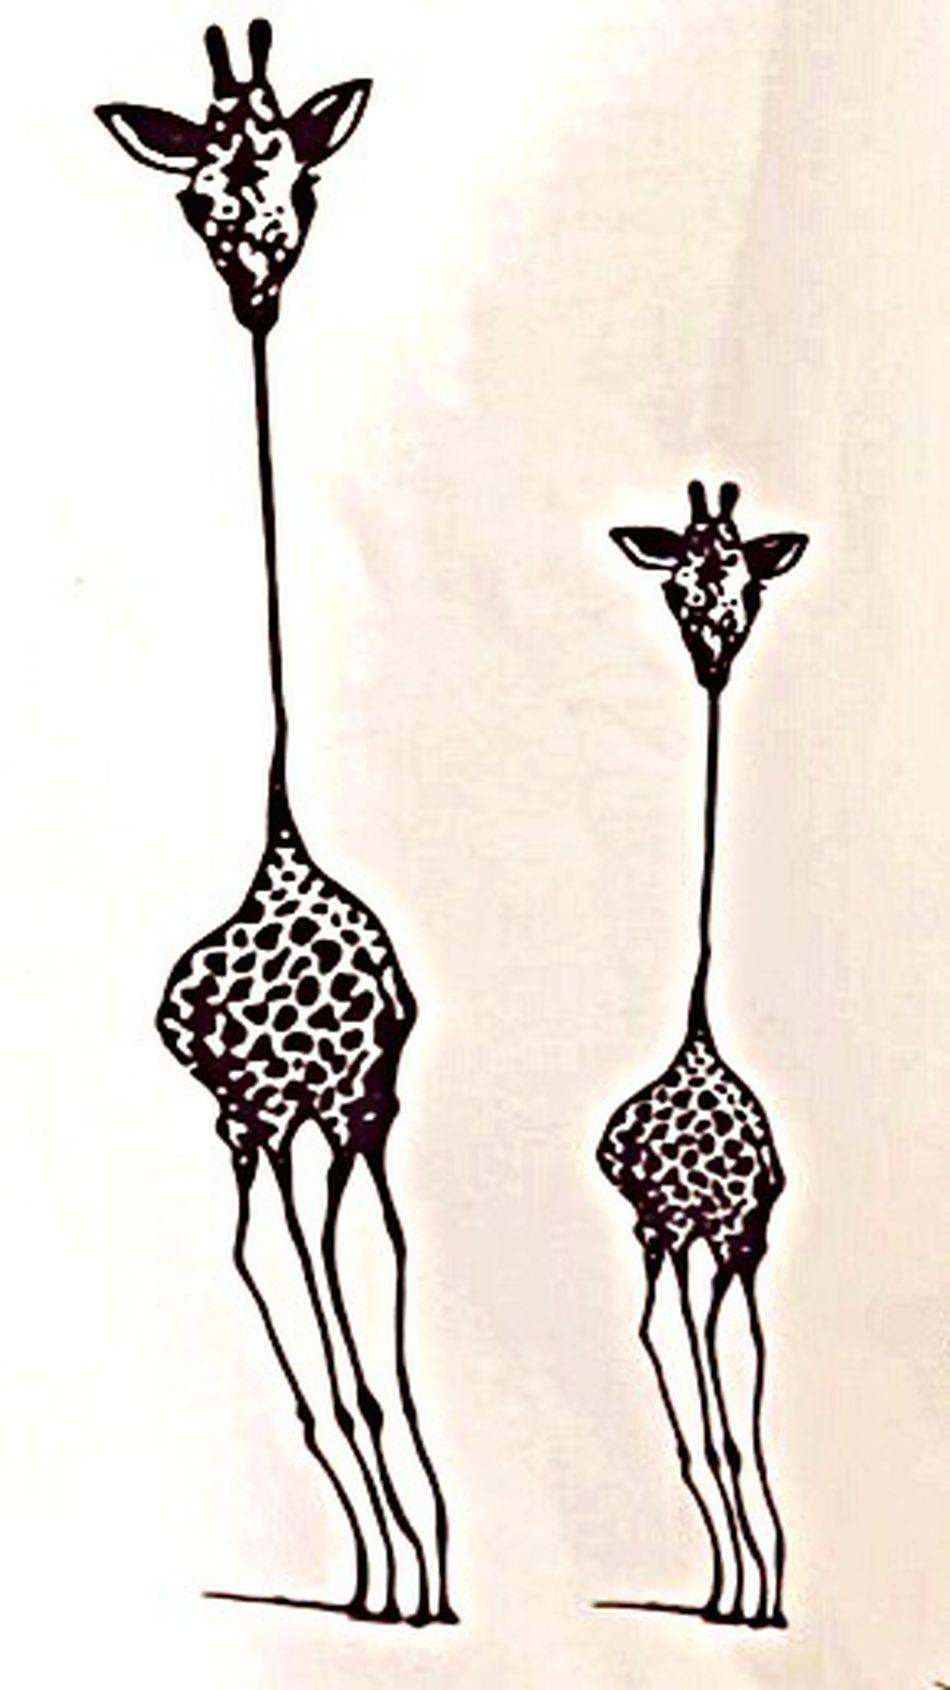 Favorite animal 😍 Giraffes Giraffe♥ Favorite Animal Animal Love